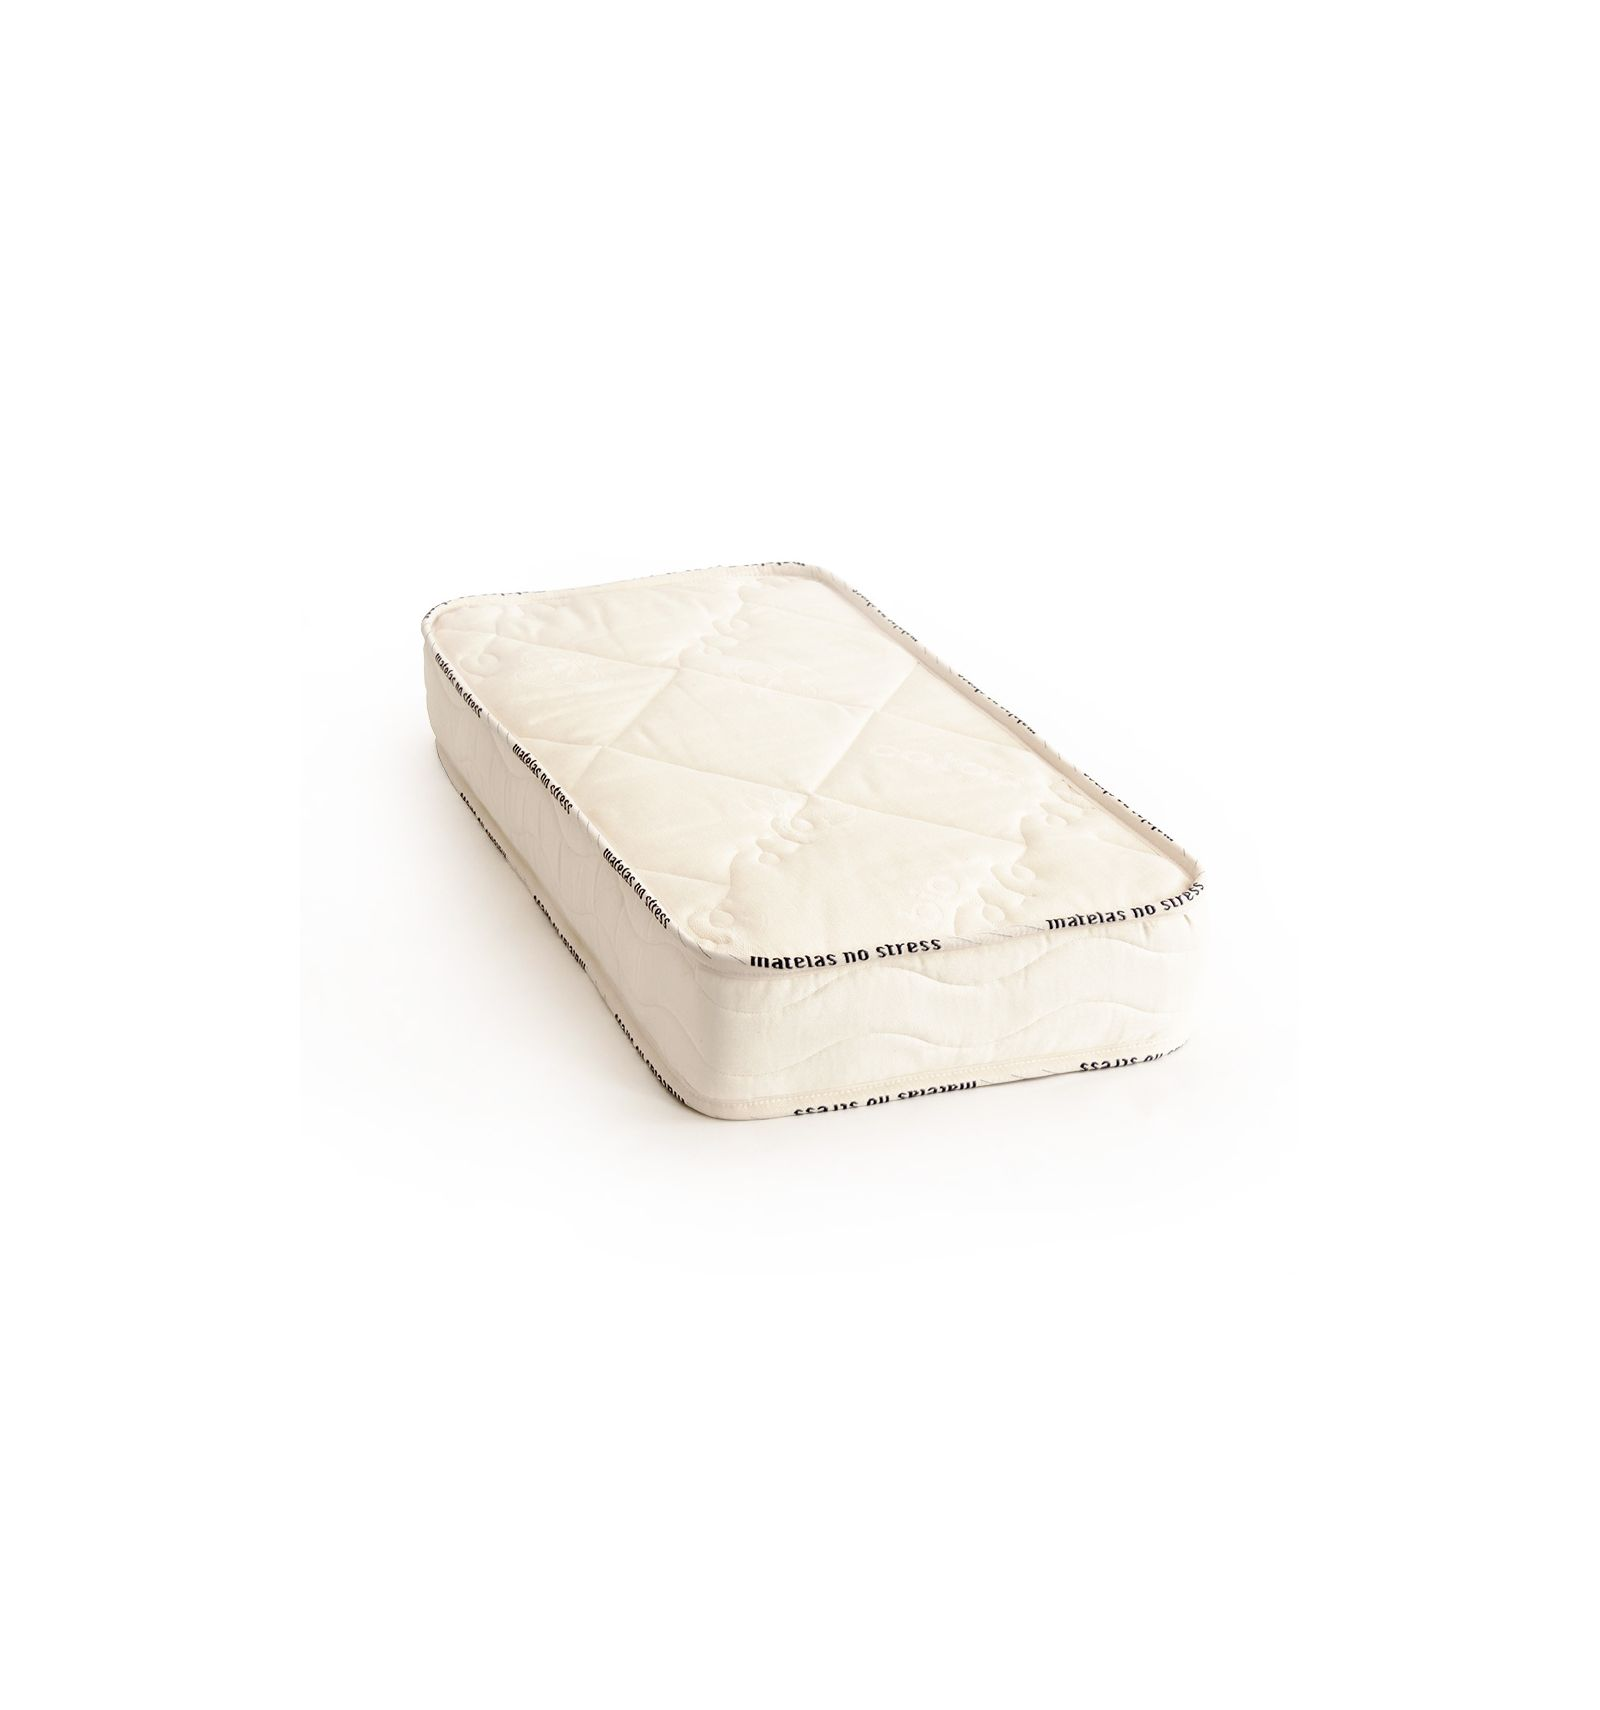 Matelas berceau rectangulaire ou ovale 50x90 100 latex naturel 13 cm confort optimum - Matelas bebe latex naturel ...